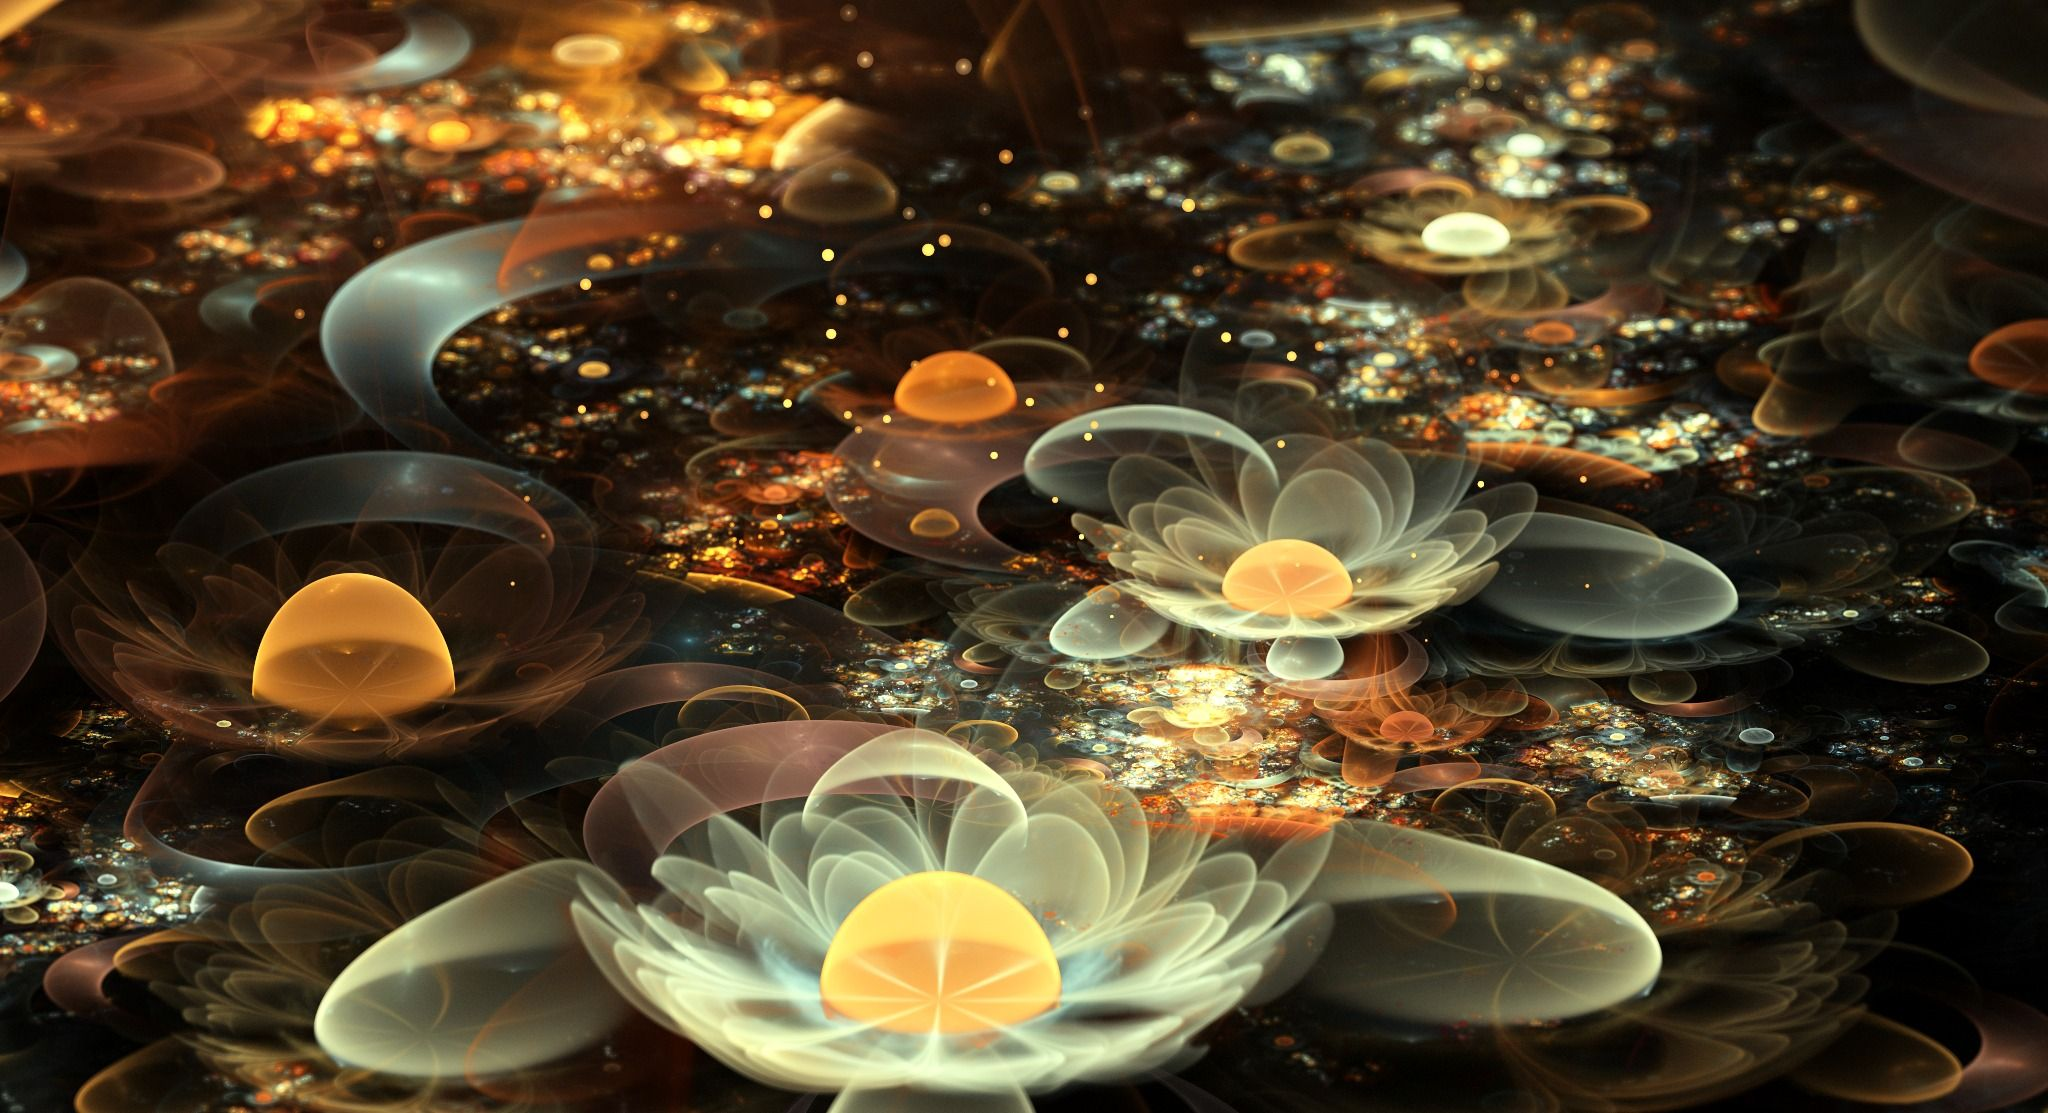 Обои цветок, свечение, фрактал, свет, абстракция. Абстракции foto 15